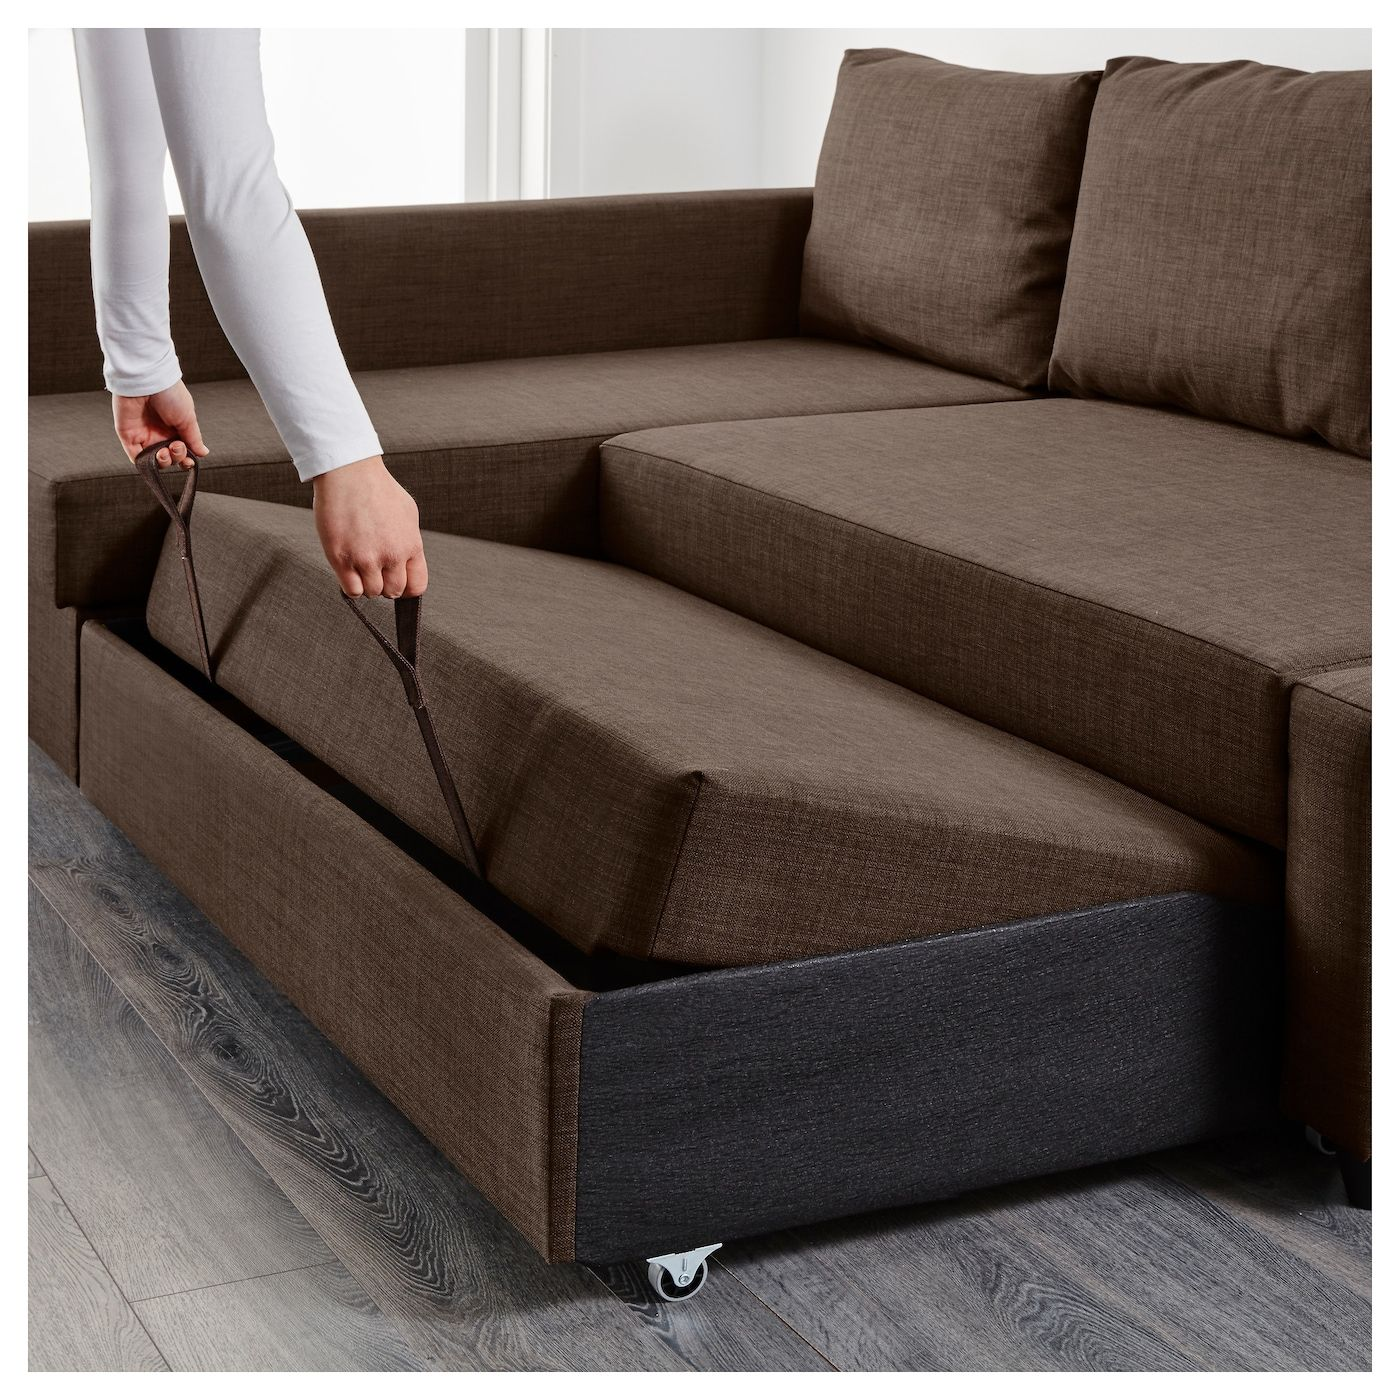 Stupendous Us Furniture And Home Furnishings In 2019 Corner Sofa Ibusinesslaw Wood Chair Design Ideas Ibusinesslaworg